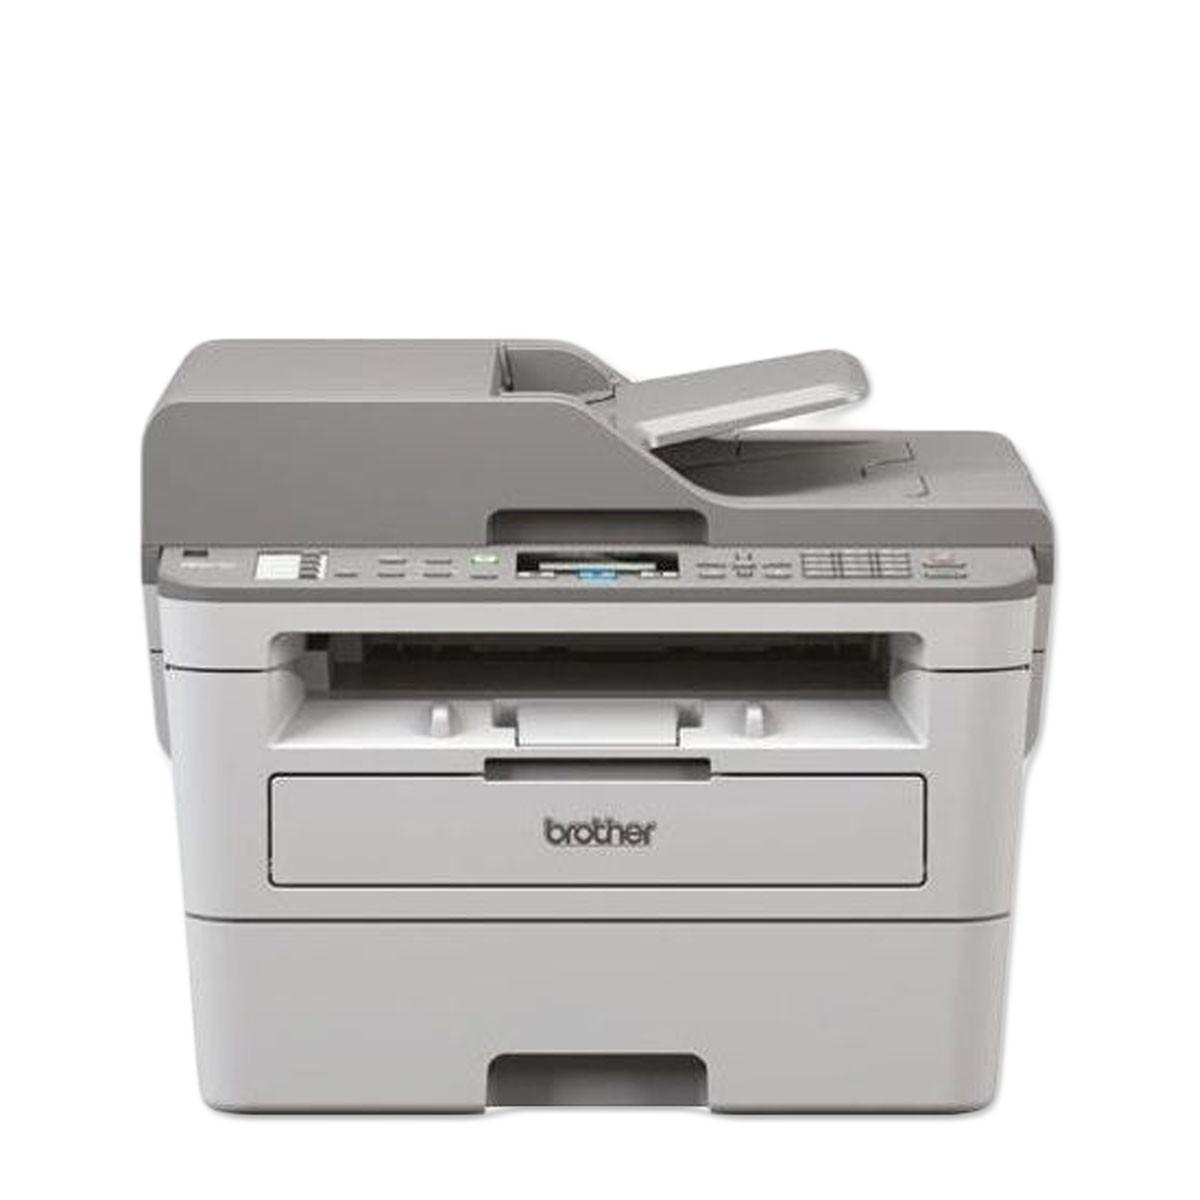 Impressora Brother DCP-B7535DW DCP-B7535 Multifuncional Laser Monocromática com Wireless e Duplex